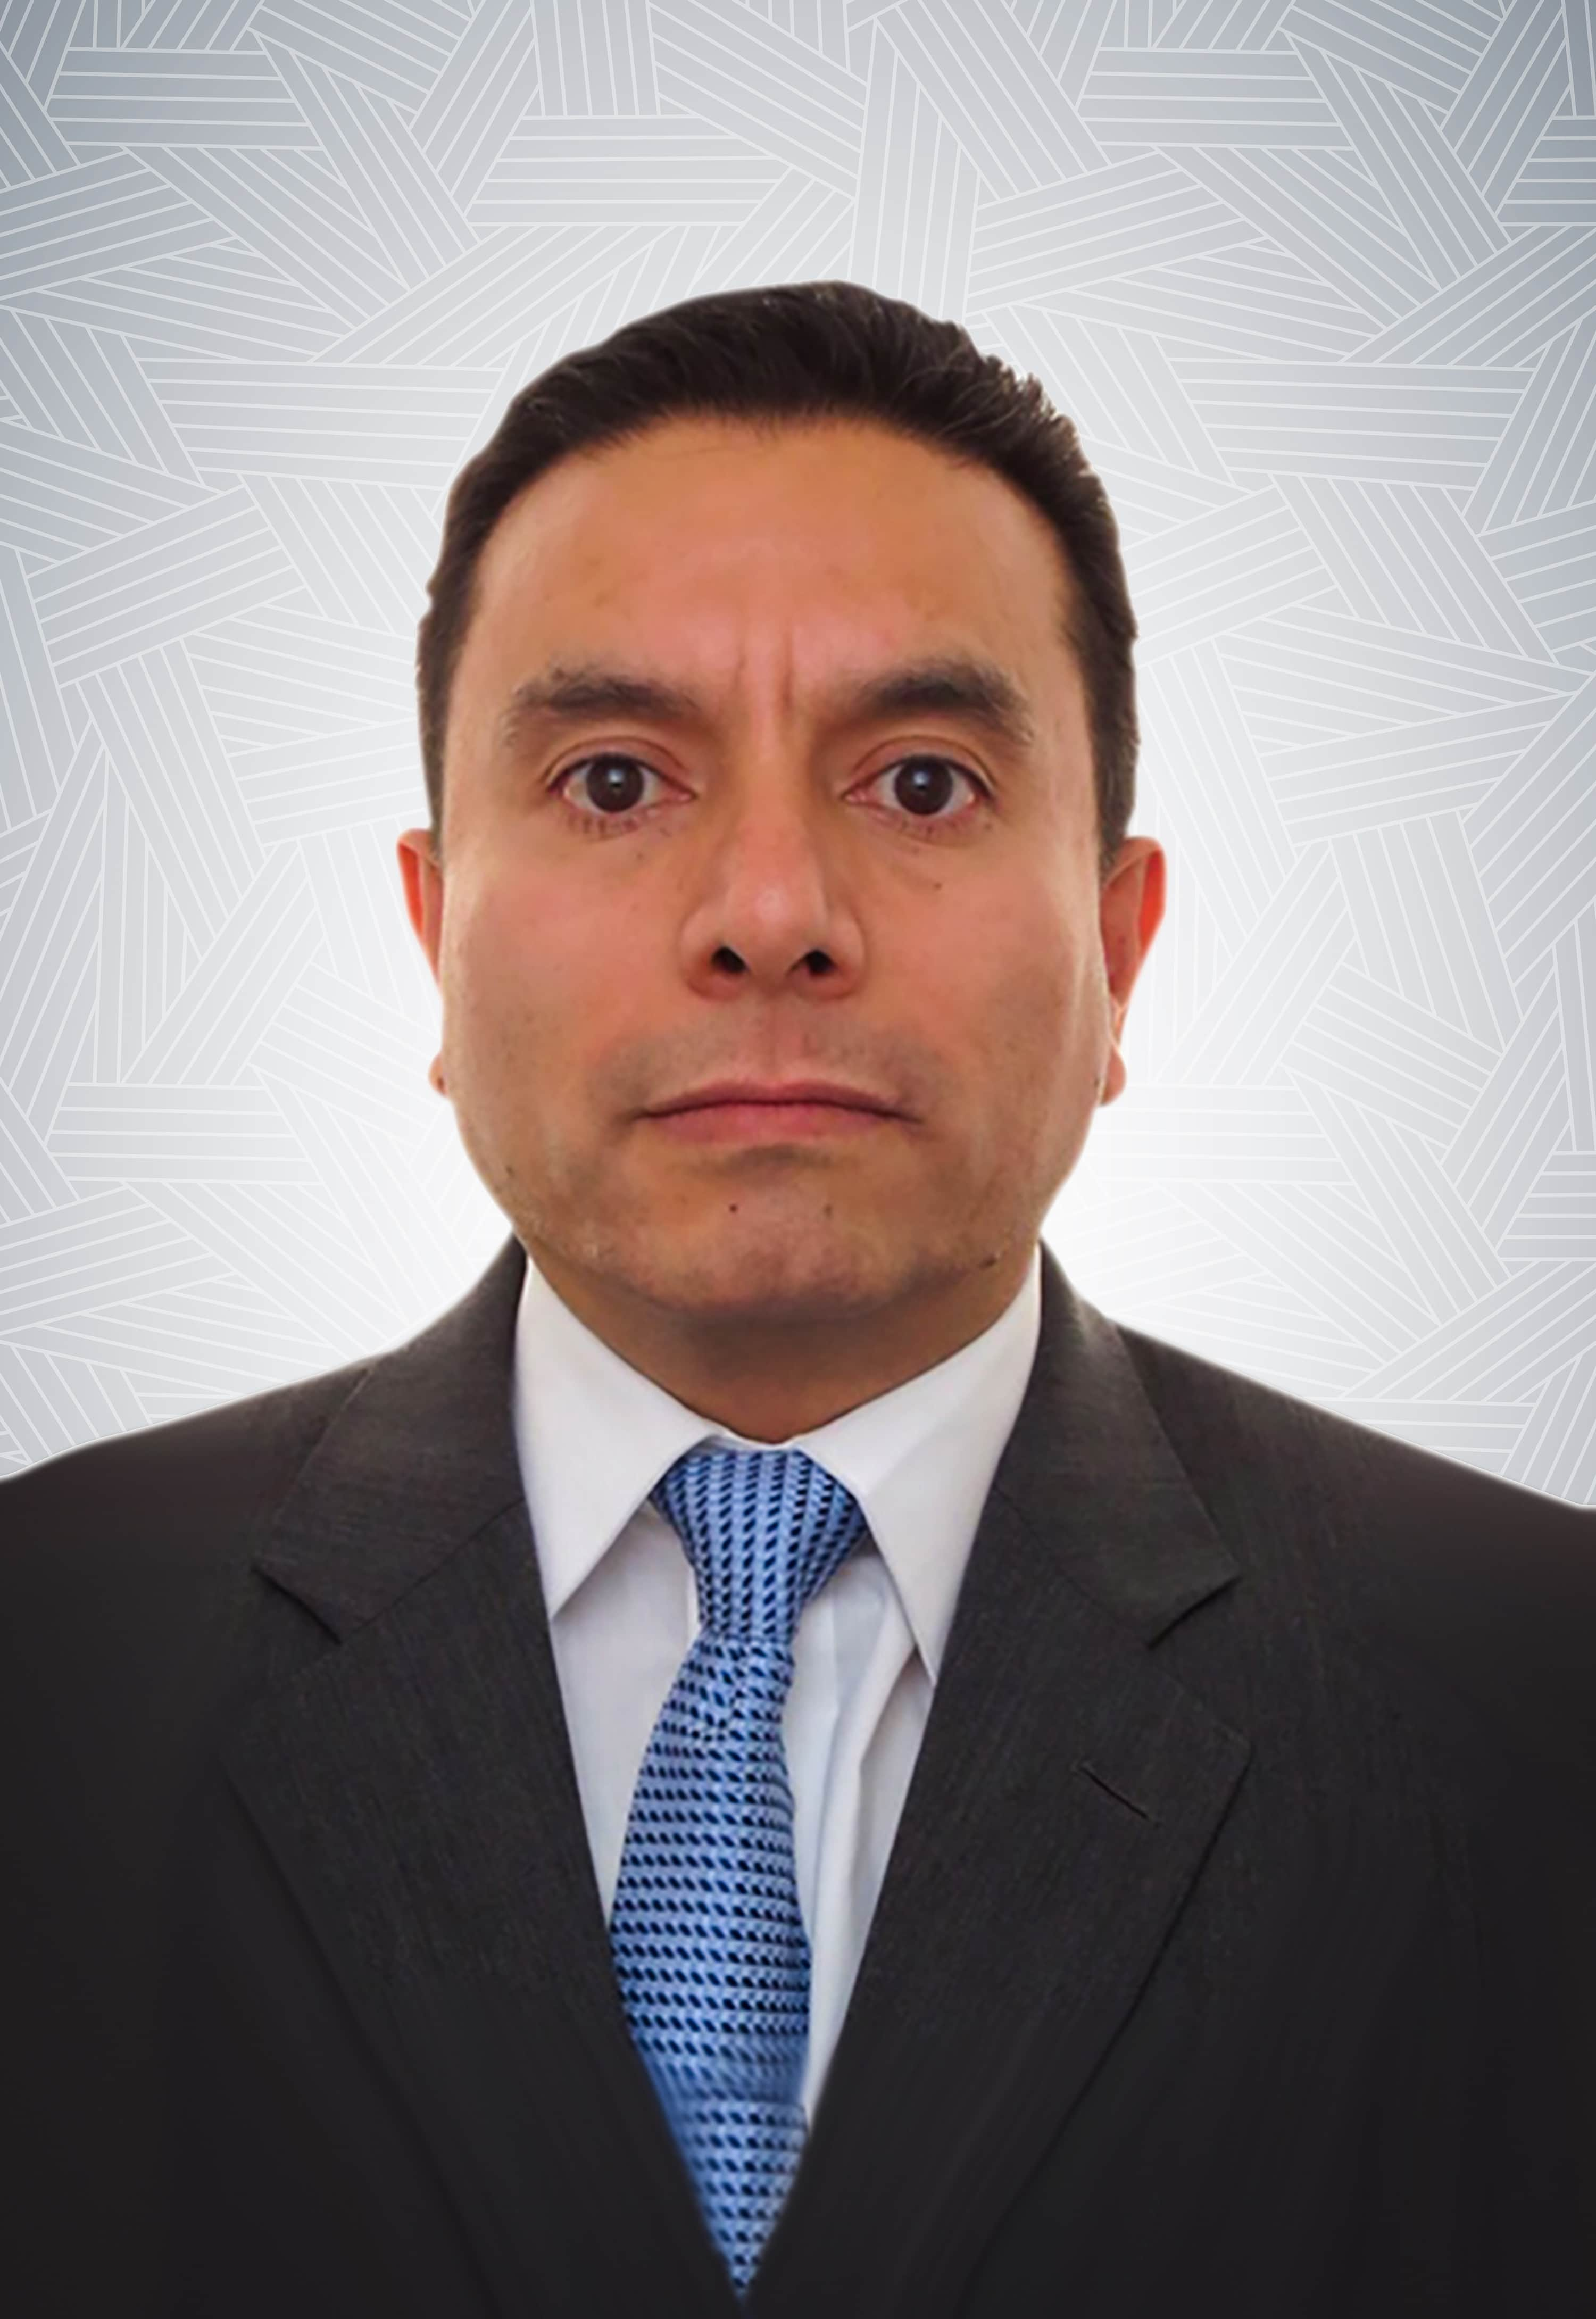 Jorge Rubio Elorza